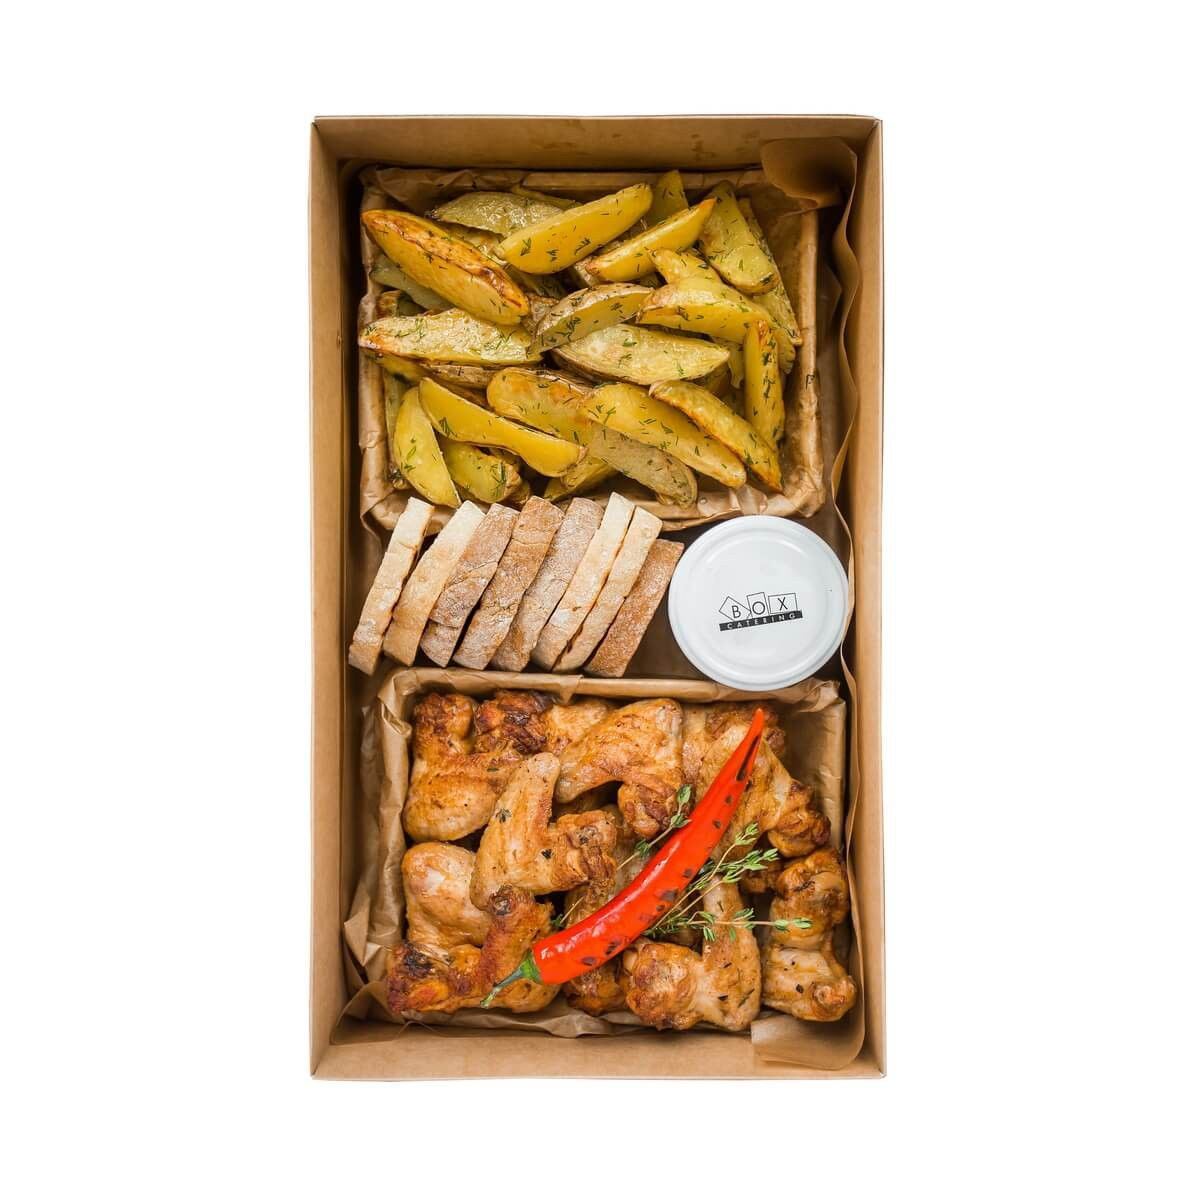 Chicken big box фото 1